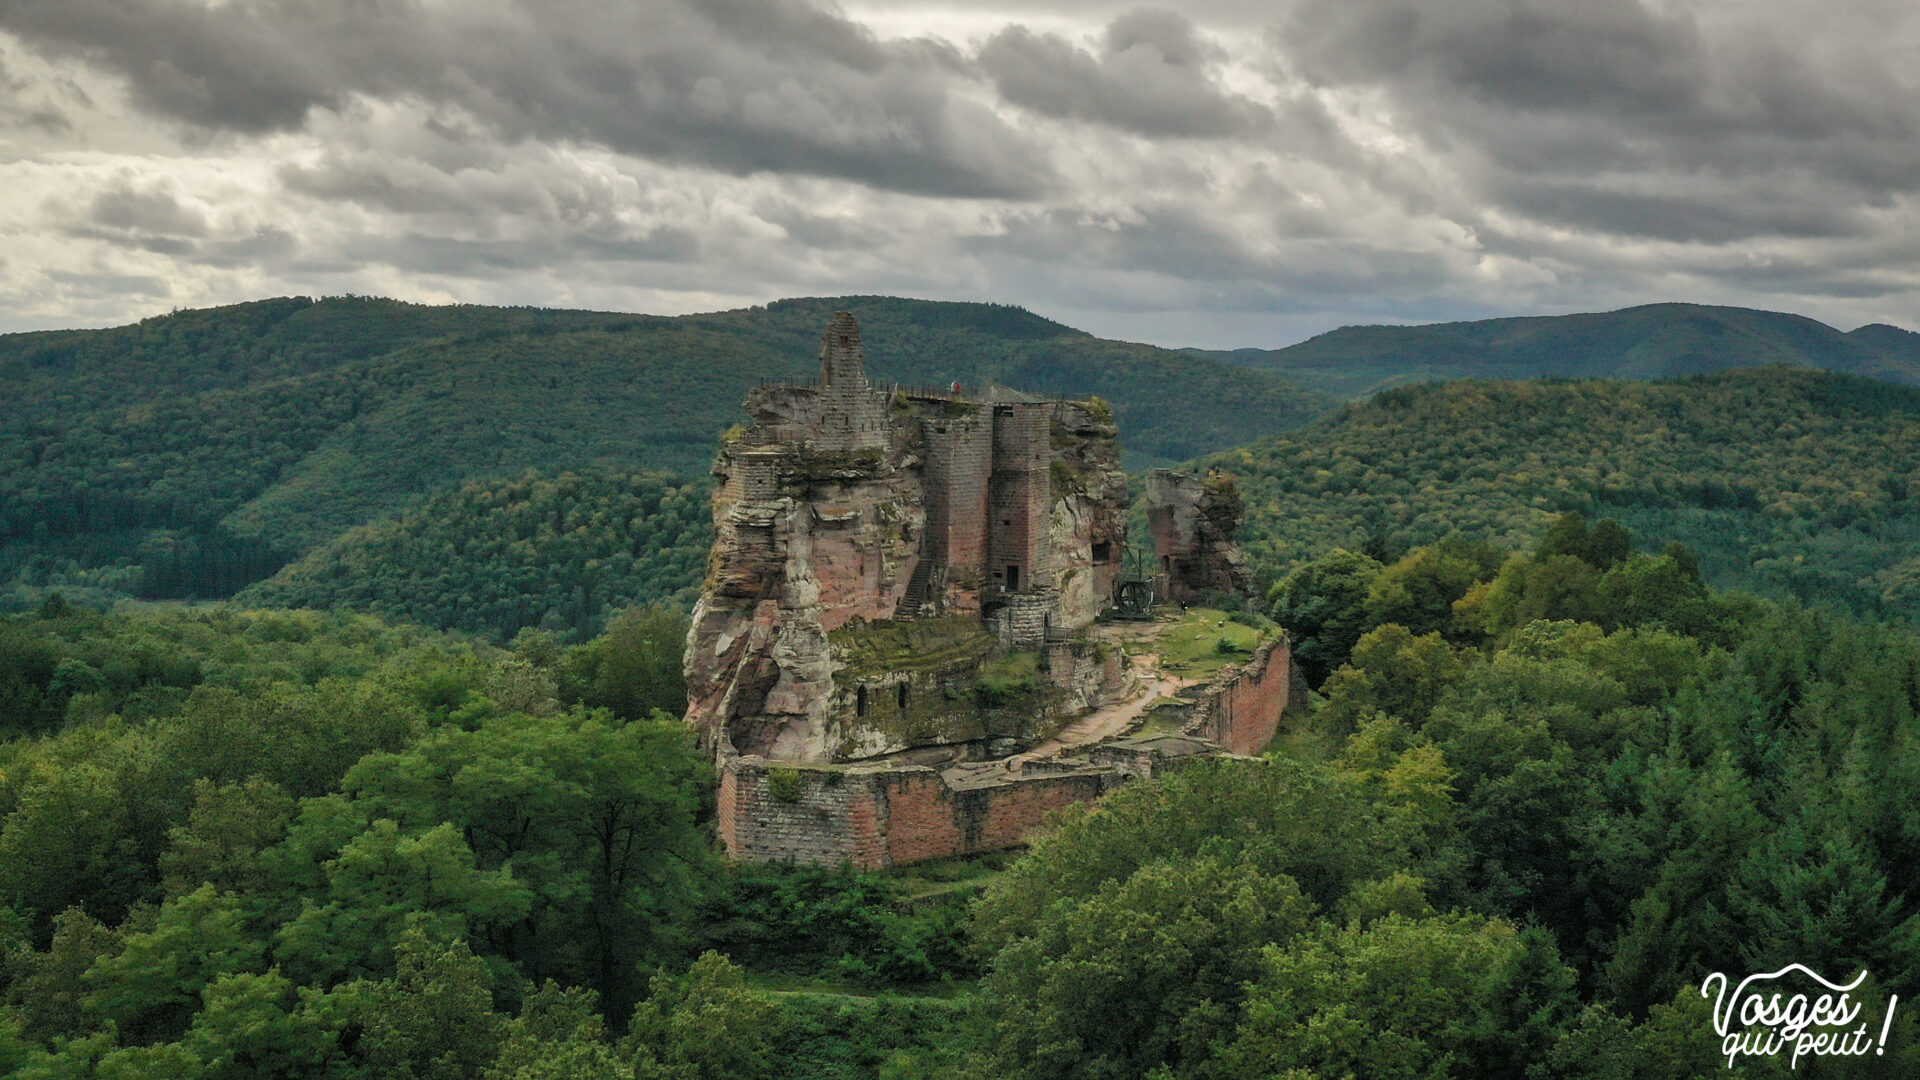 Vue aérienne du château du Fleckenstein